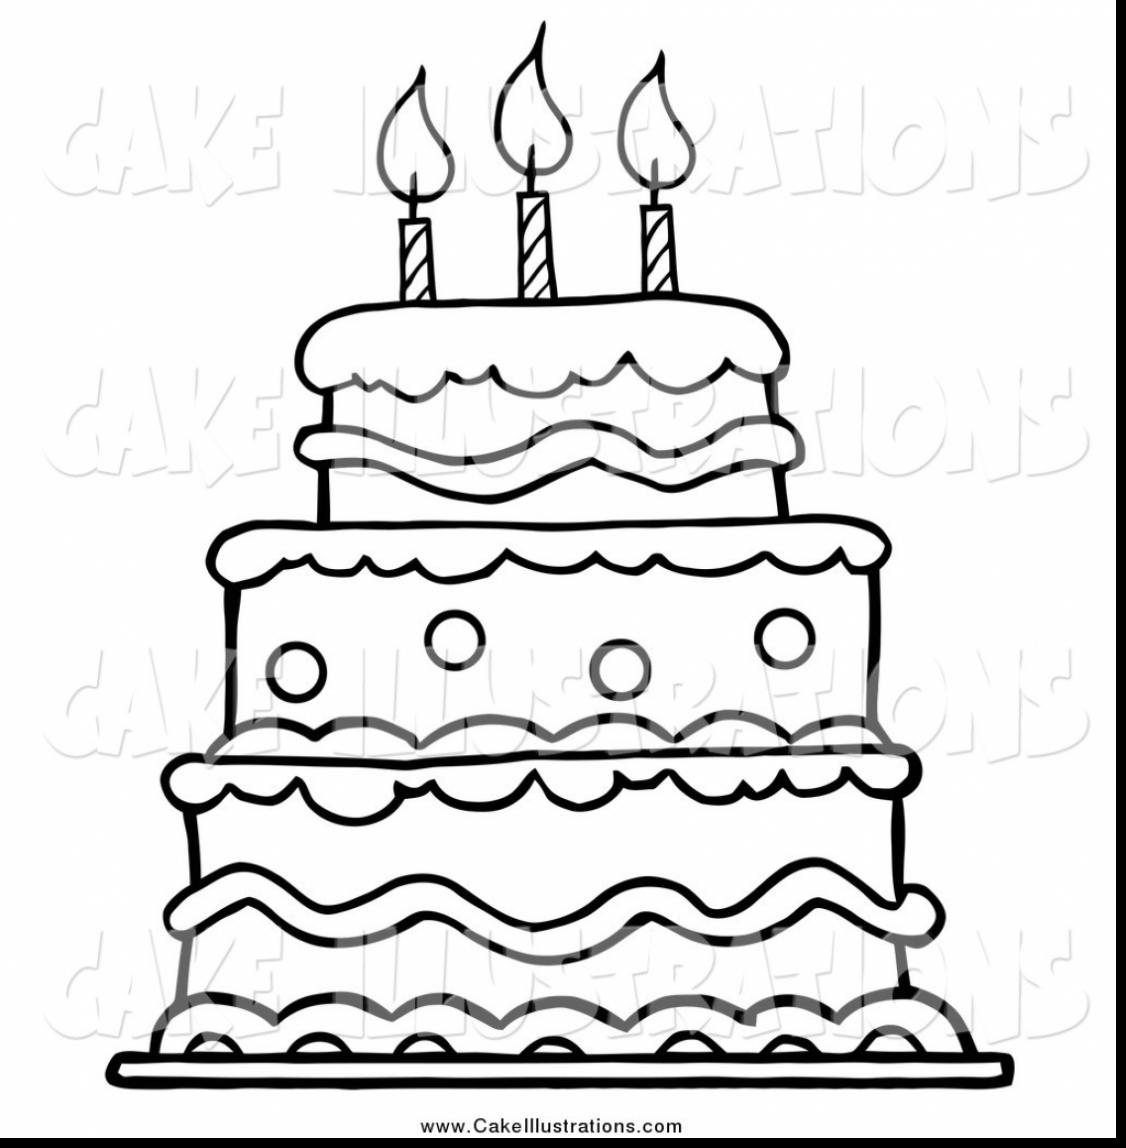 Birthday Cake Drawing Step By Step At Getdrawings